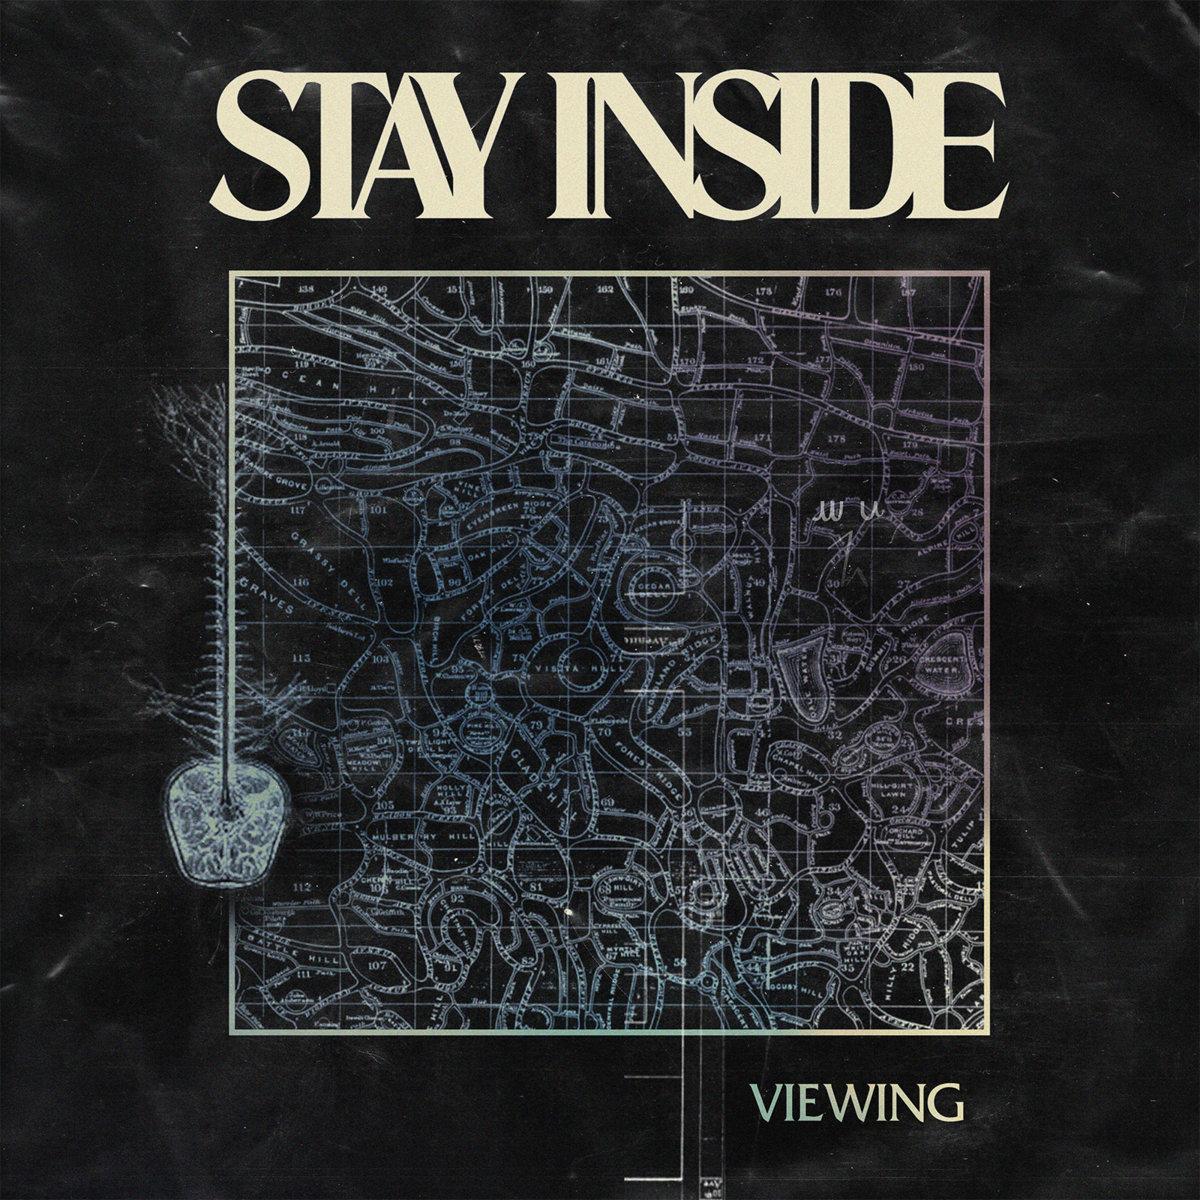 stay inside viewing альбом рецензия 2020